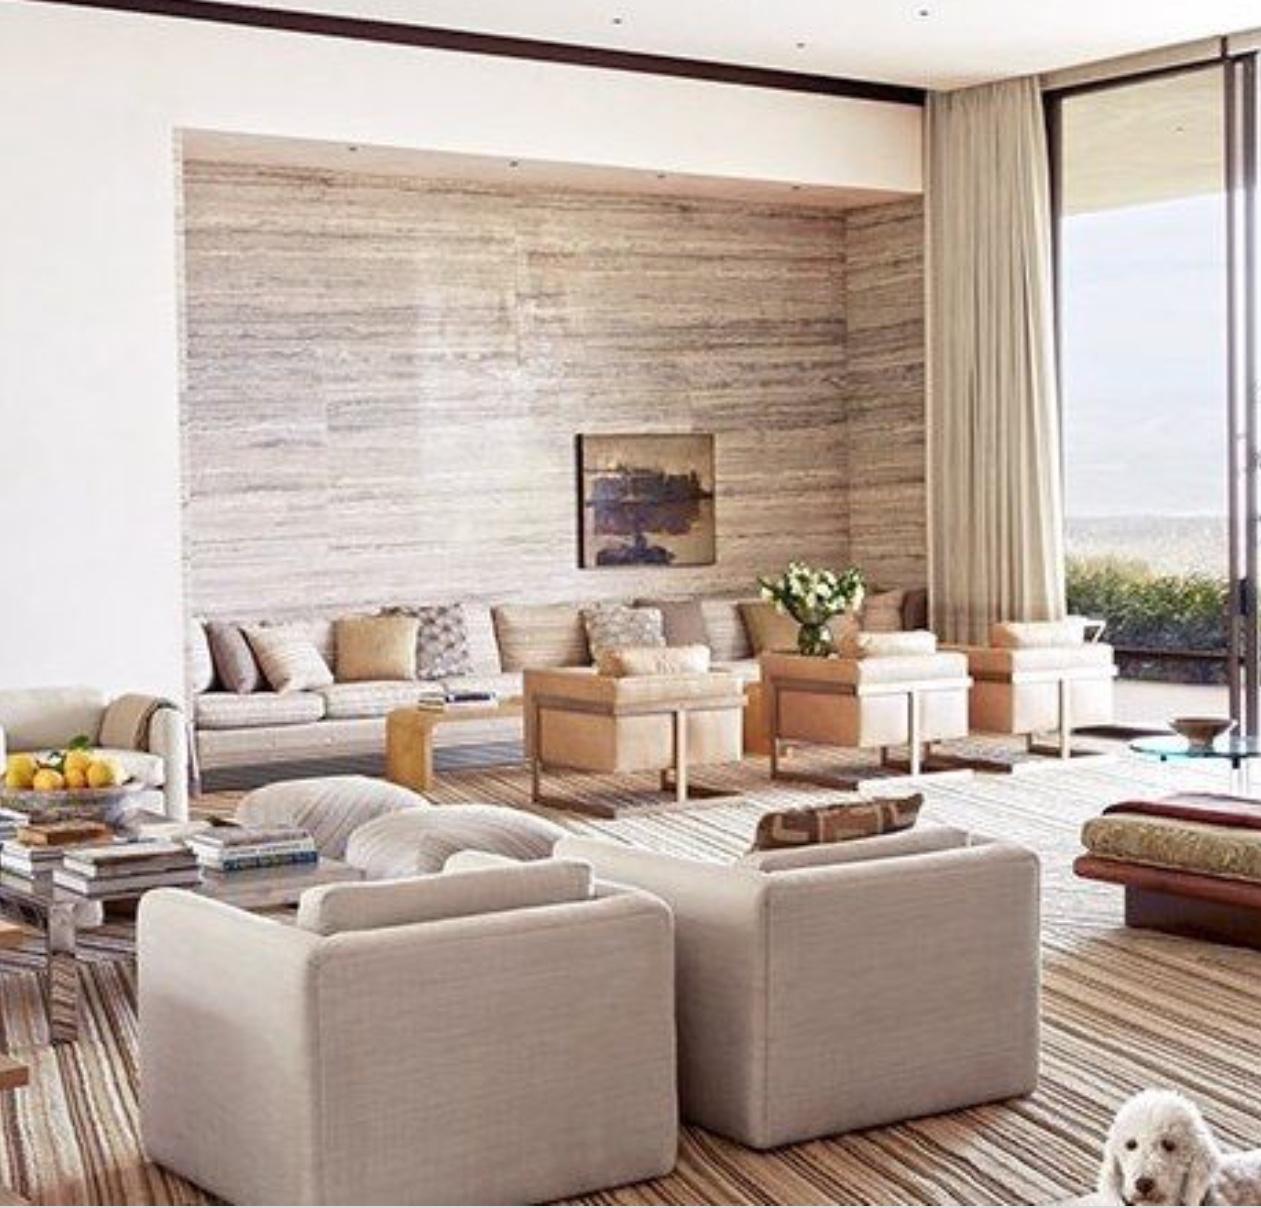 palm springs style via michael s smith living room with travertine walls belle vivir - Michael S Smith Interior Designer